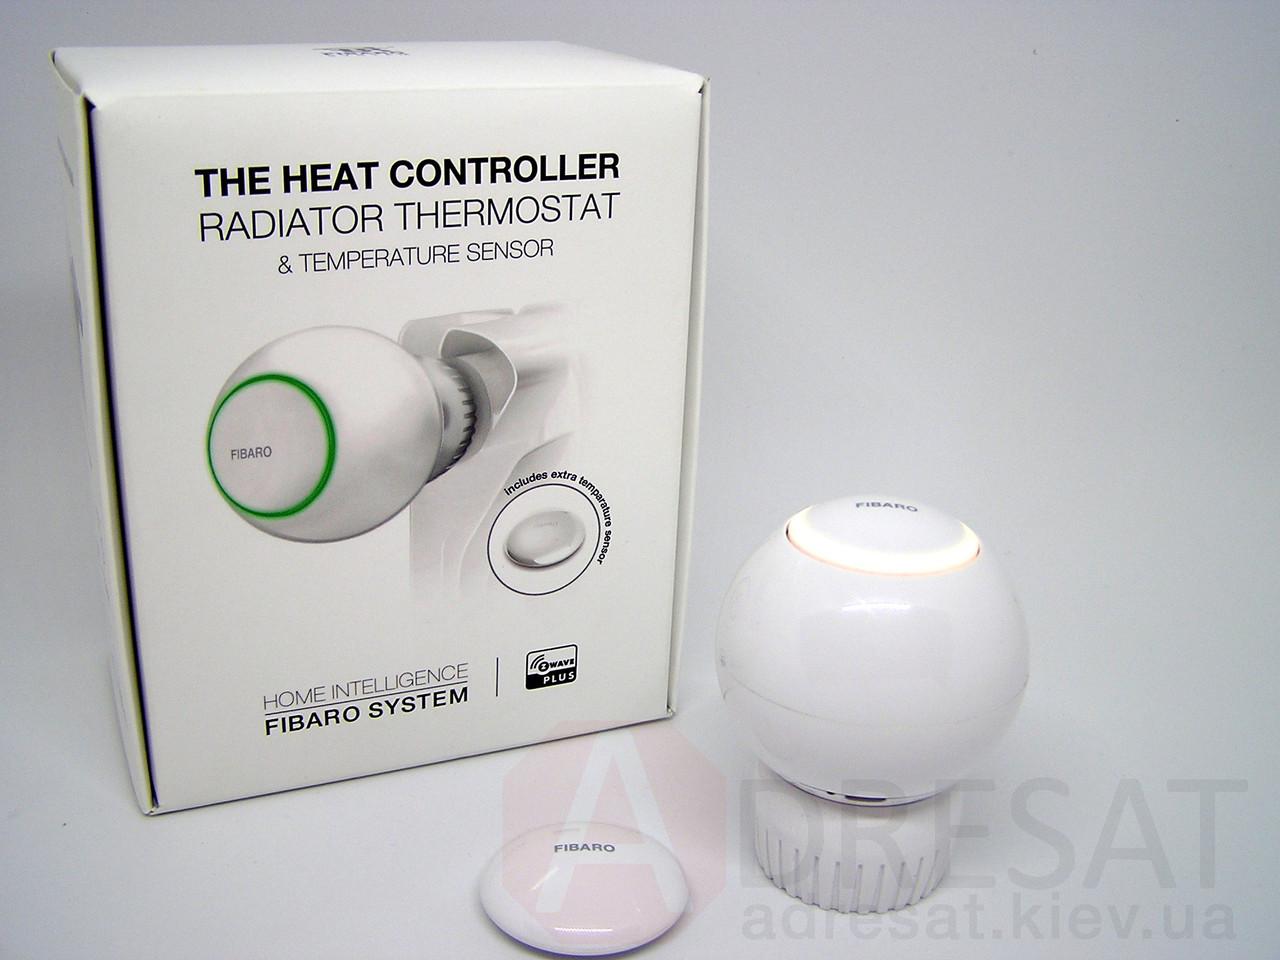 Радіаторний термостат з датчиком температури FIBARO Radiator Thermostat Starter Pack — FIBEFGT-START